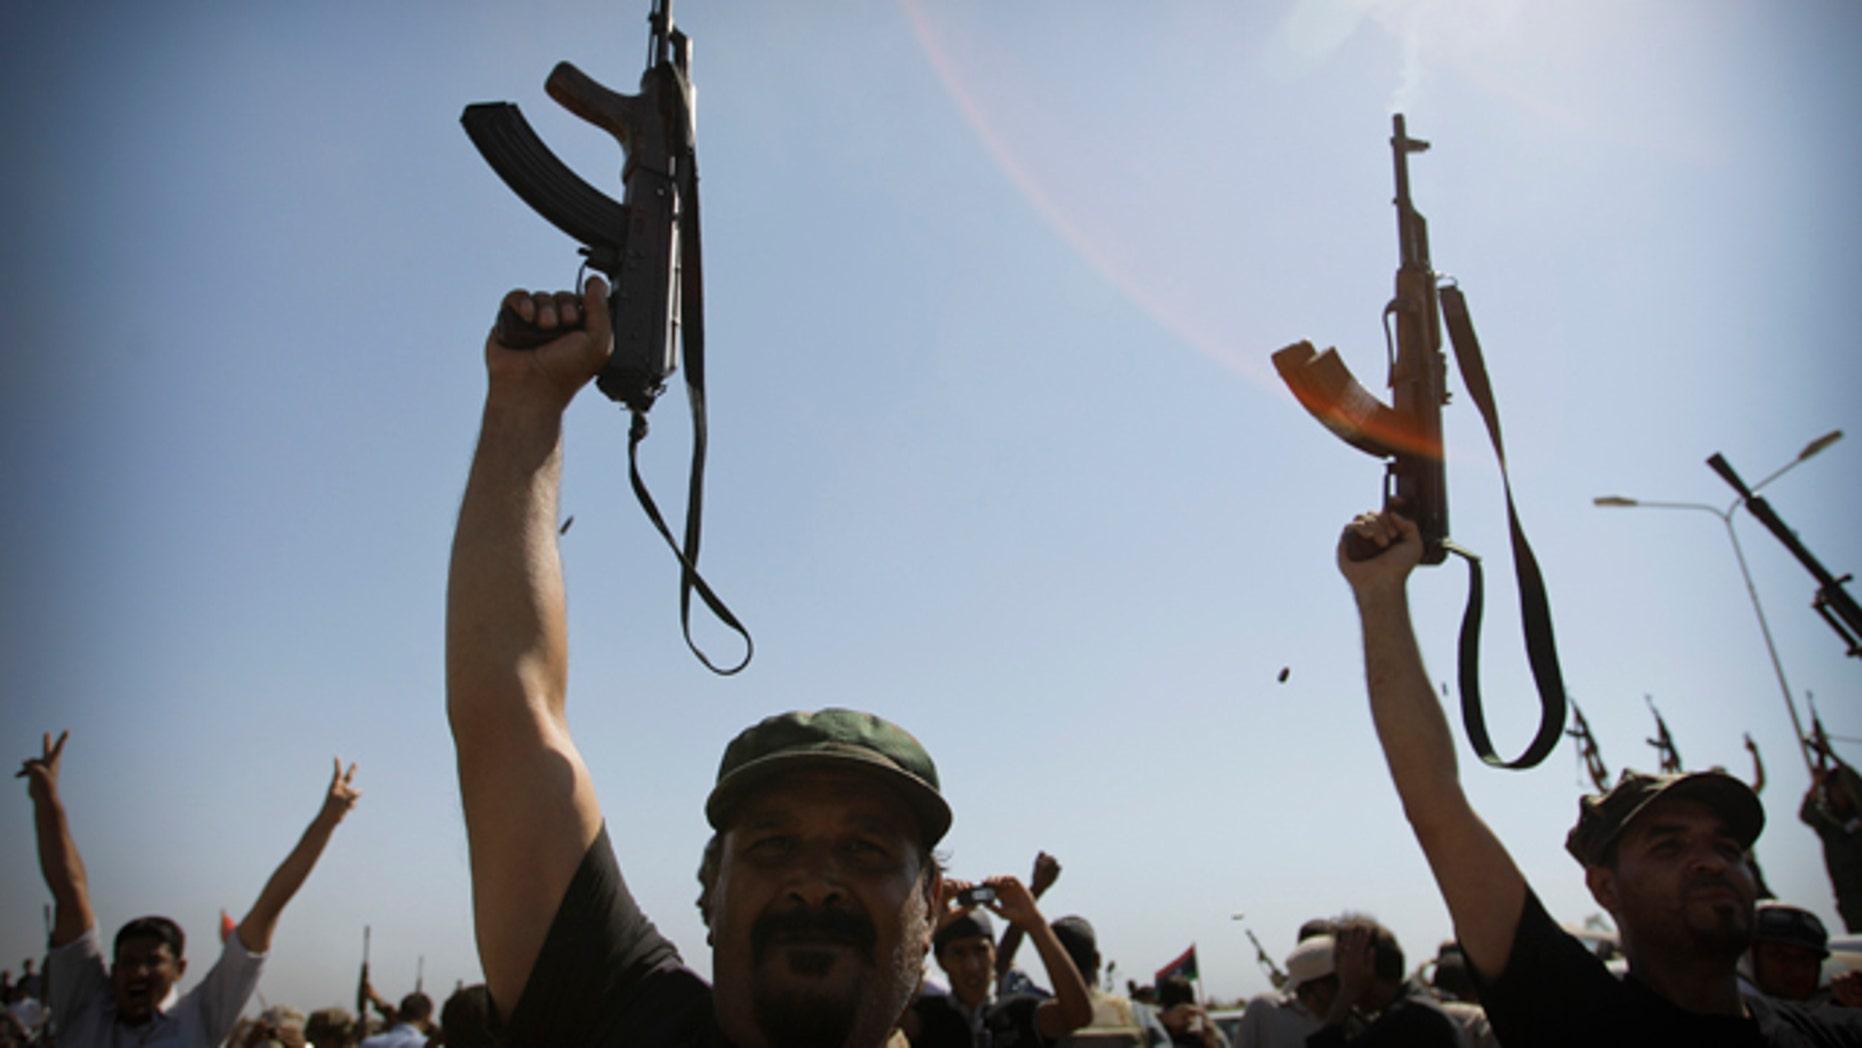 July 29: Libyan men shoot in the air during the funeral of Libyan rebels' slain military chief Abdel-Fattah Younis in the rebel-held town of Benghazi, Libya.